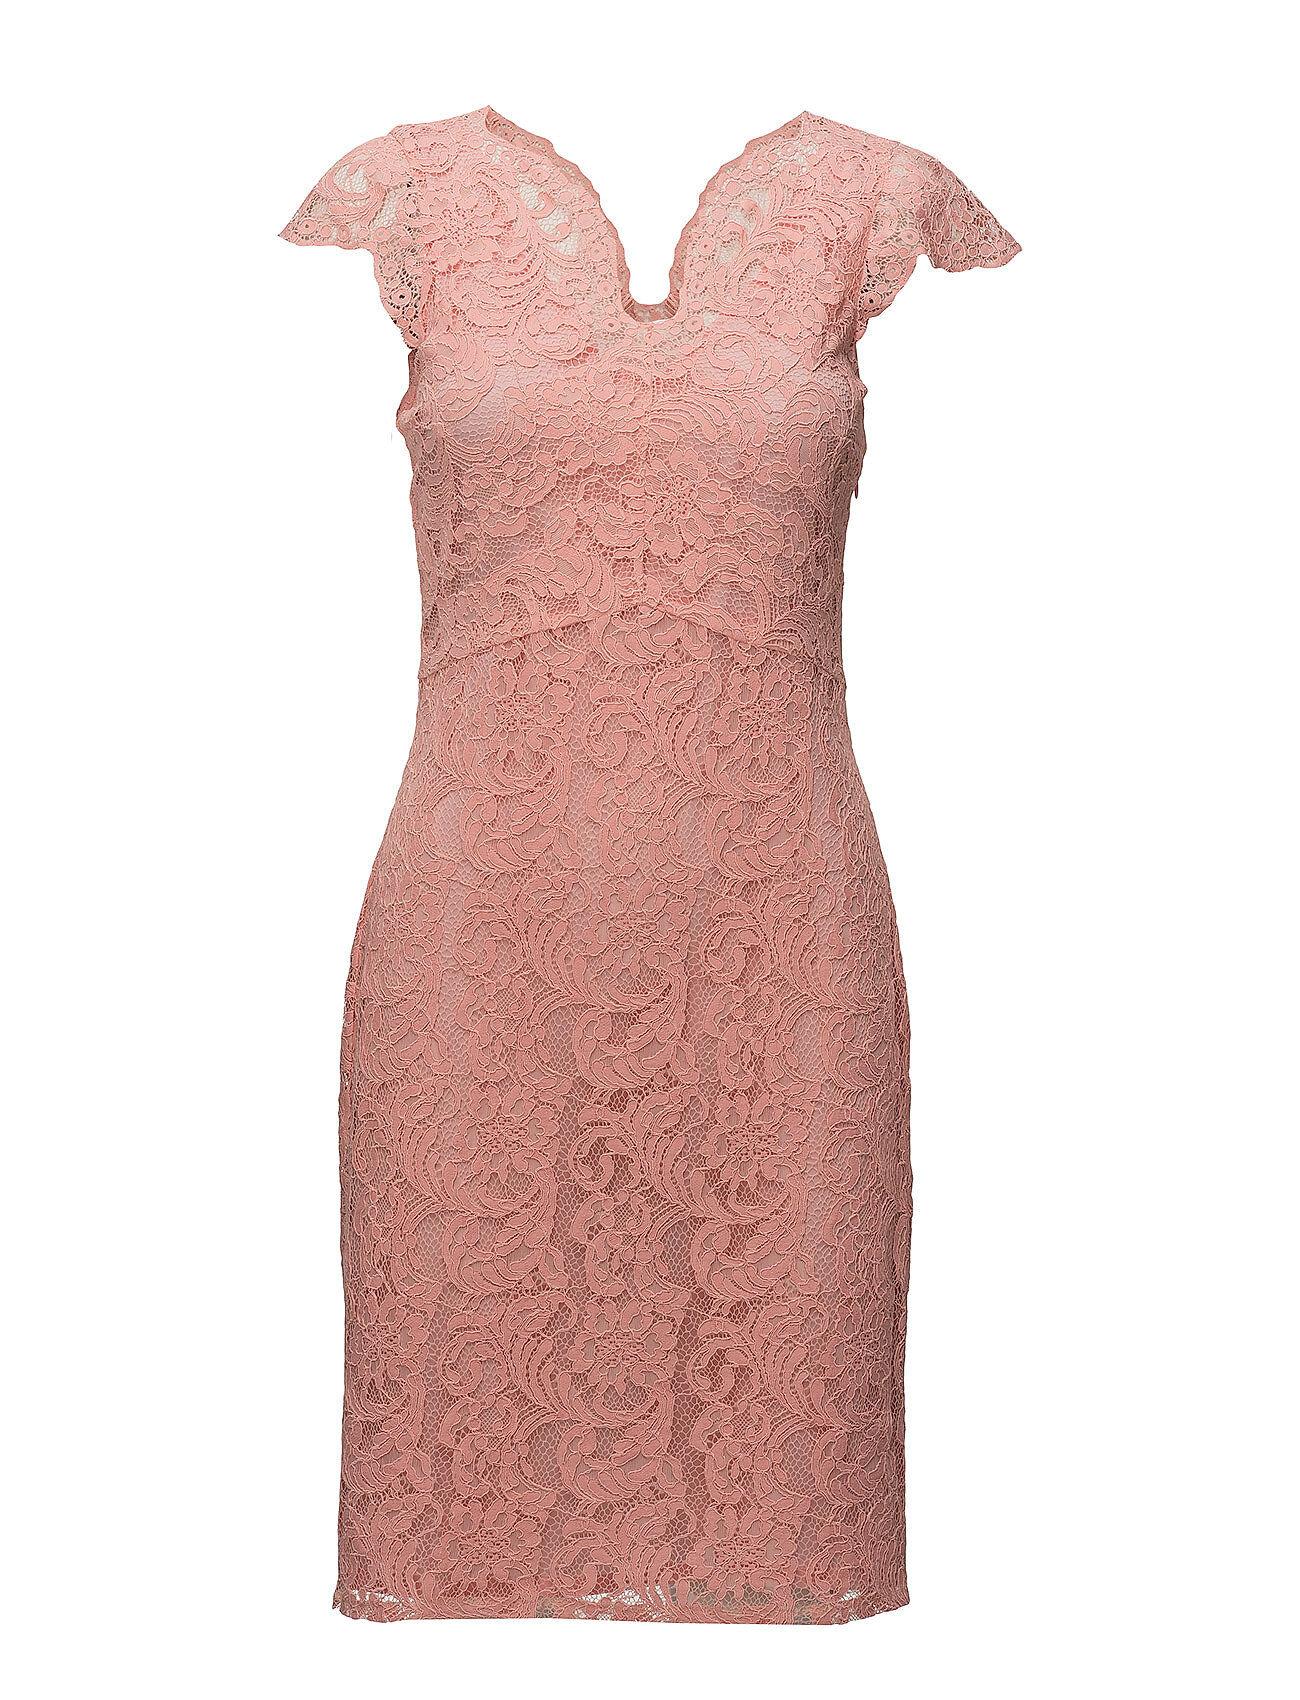 Valerie Date Dress